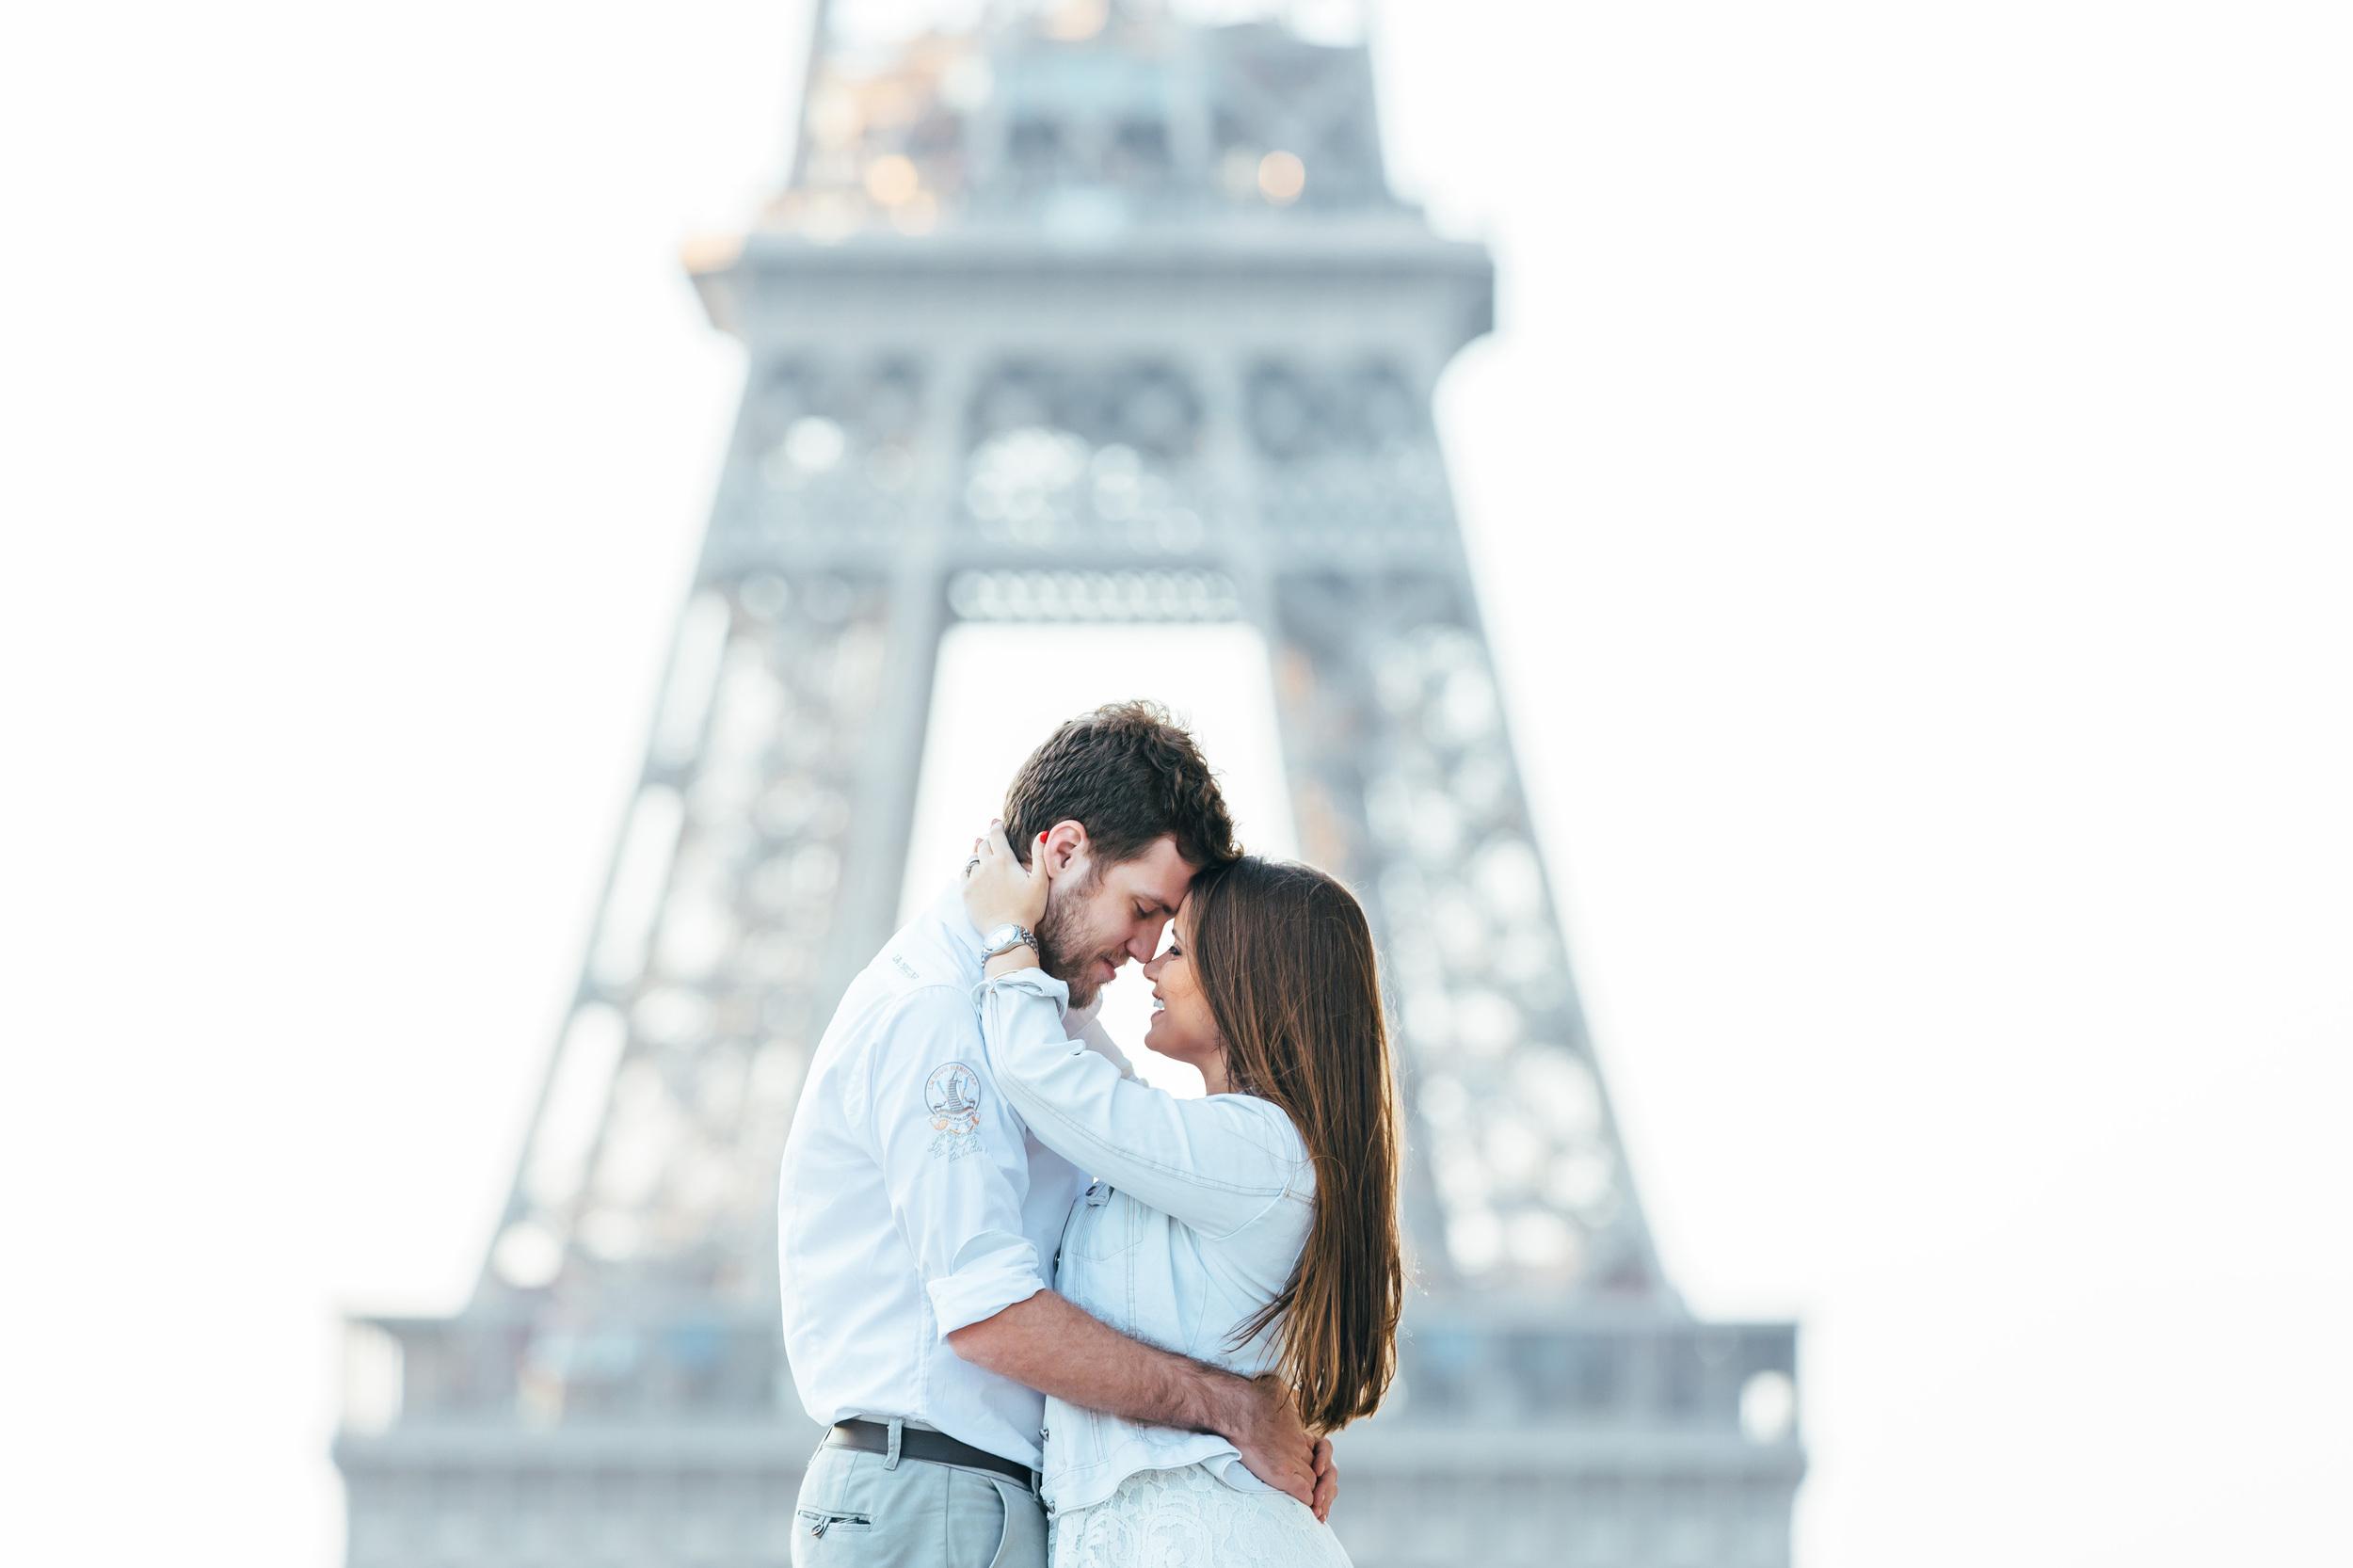 Paris Photographer, Trocadero, Lovestory, Eiffel Tower, Iheartparisfr